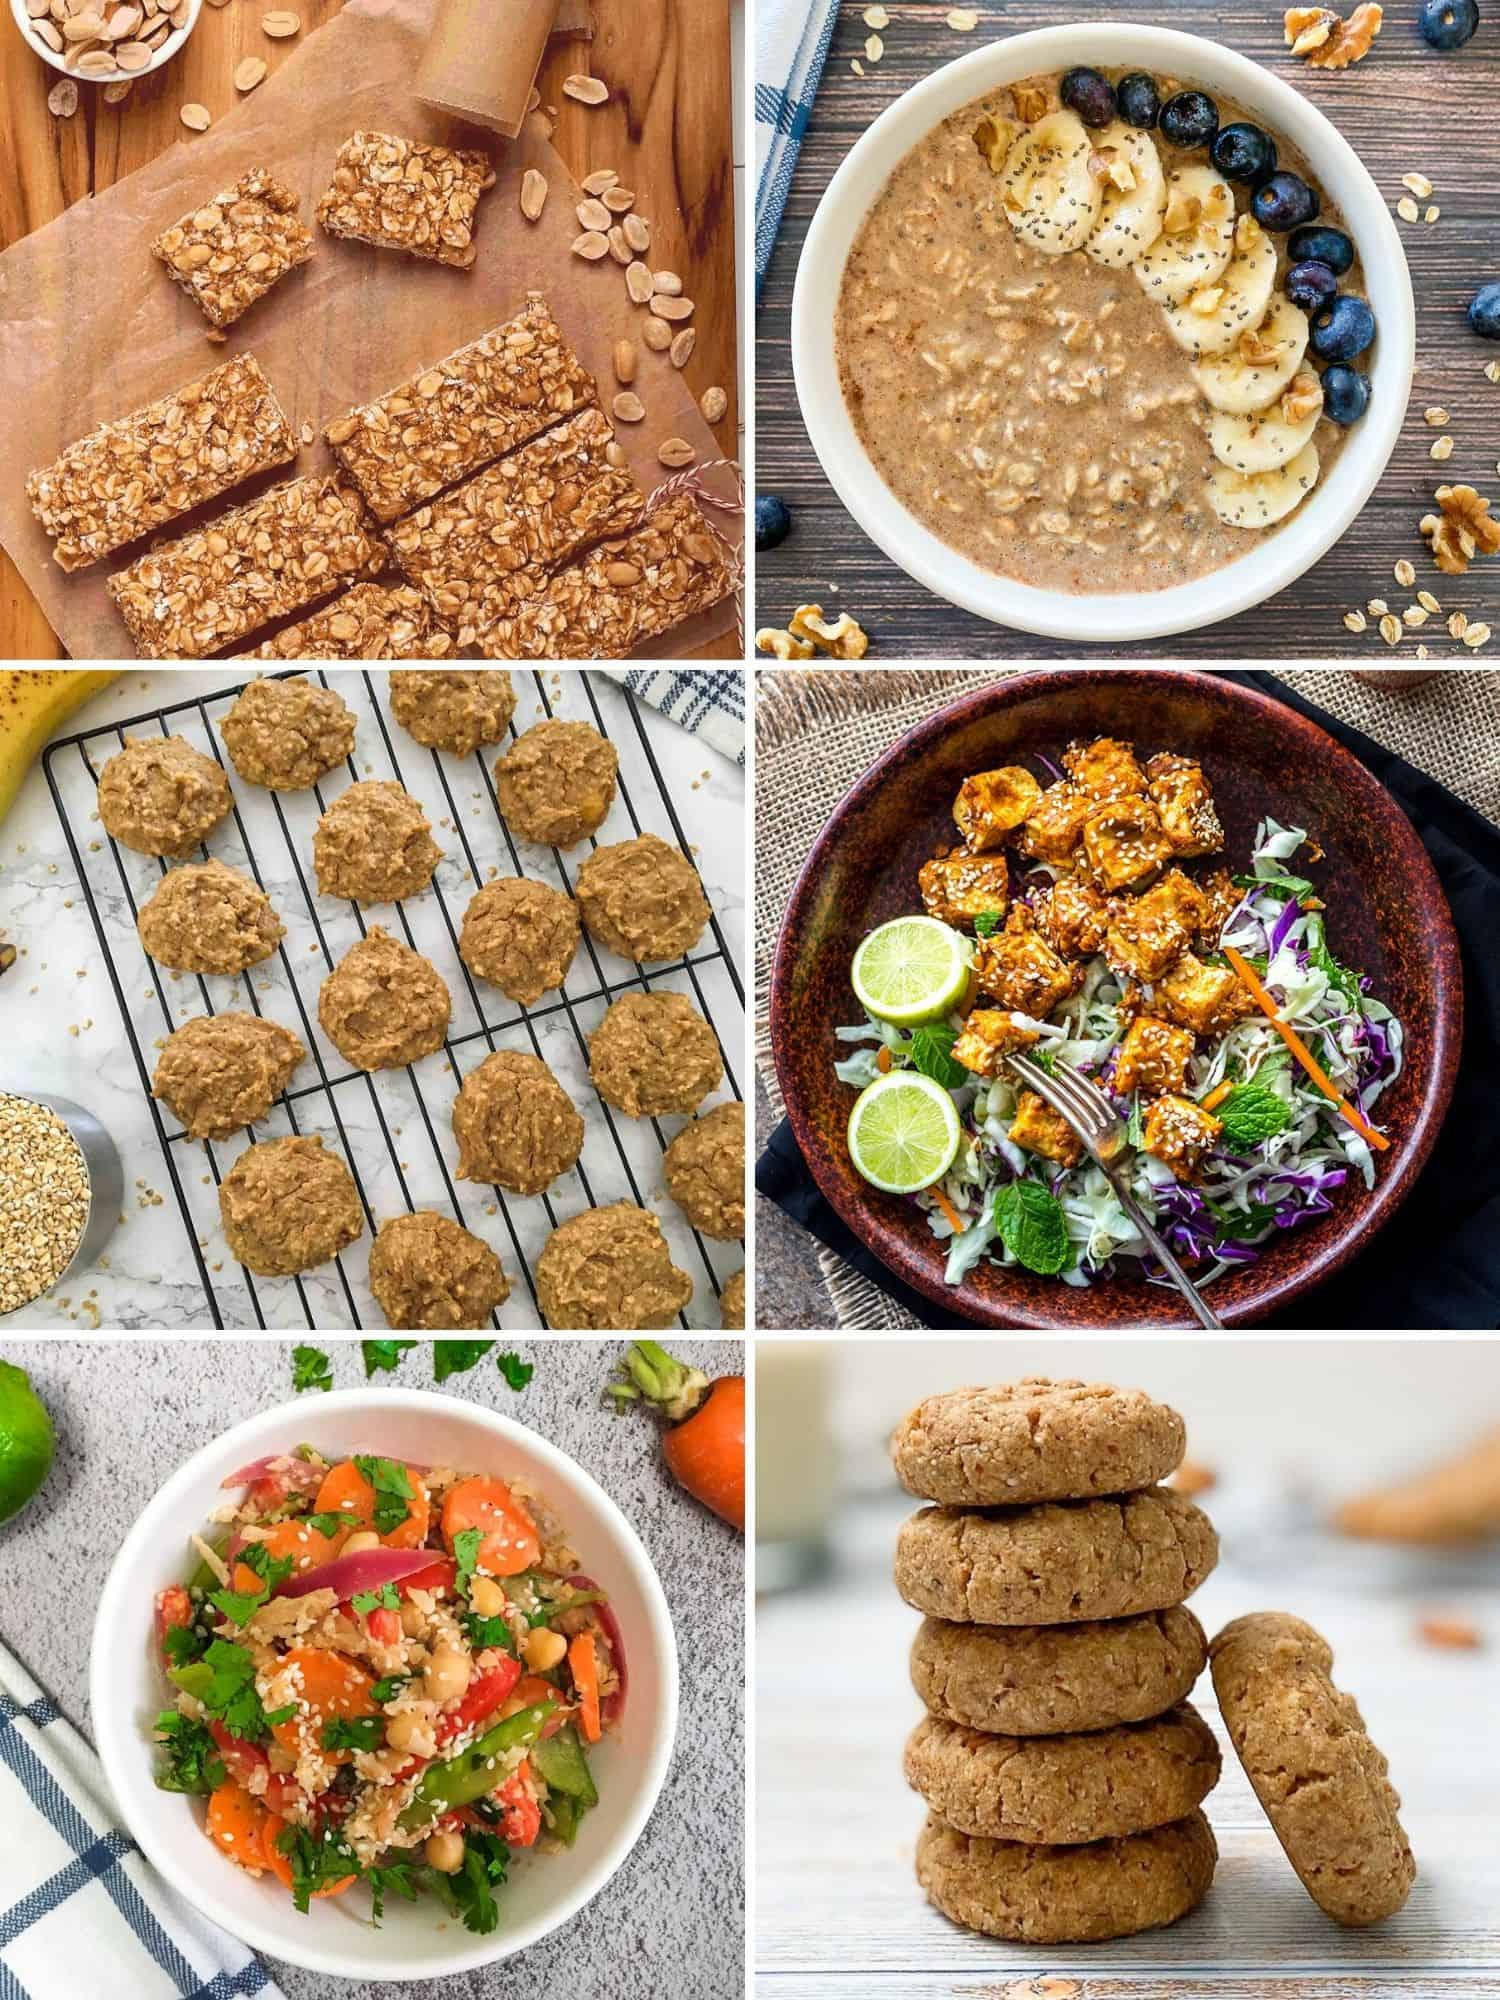 Grid of 6 images: bars, oatmeal, cookies, tofu, stir fry and cookies.